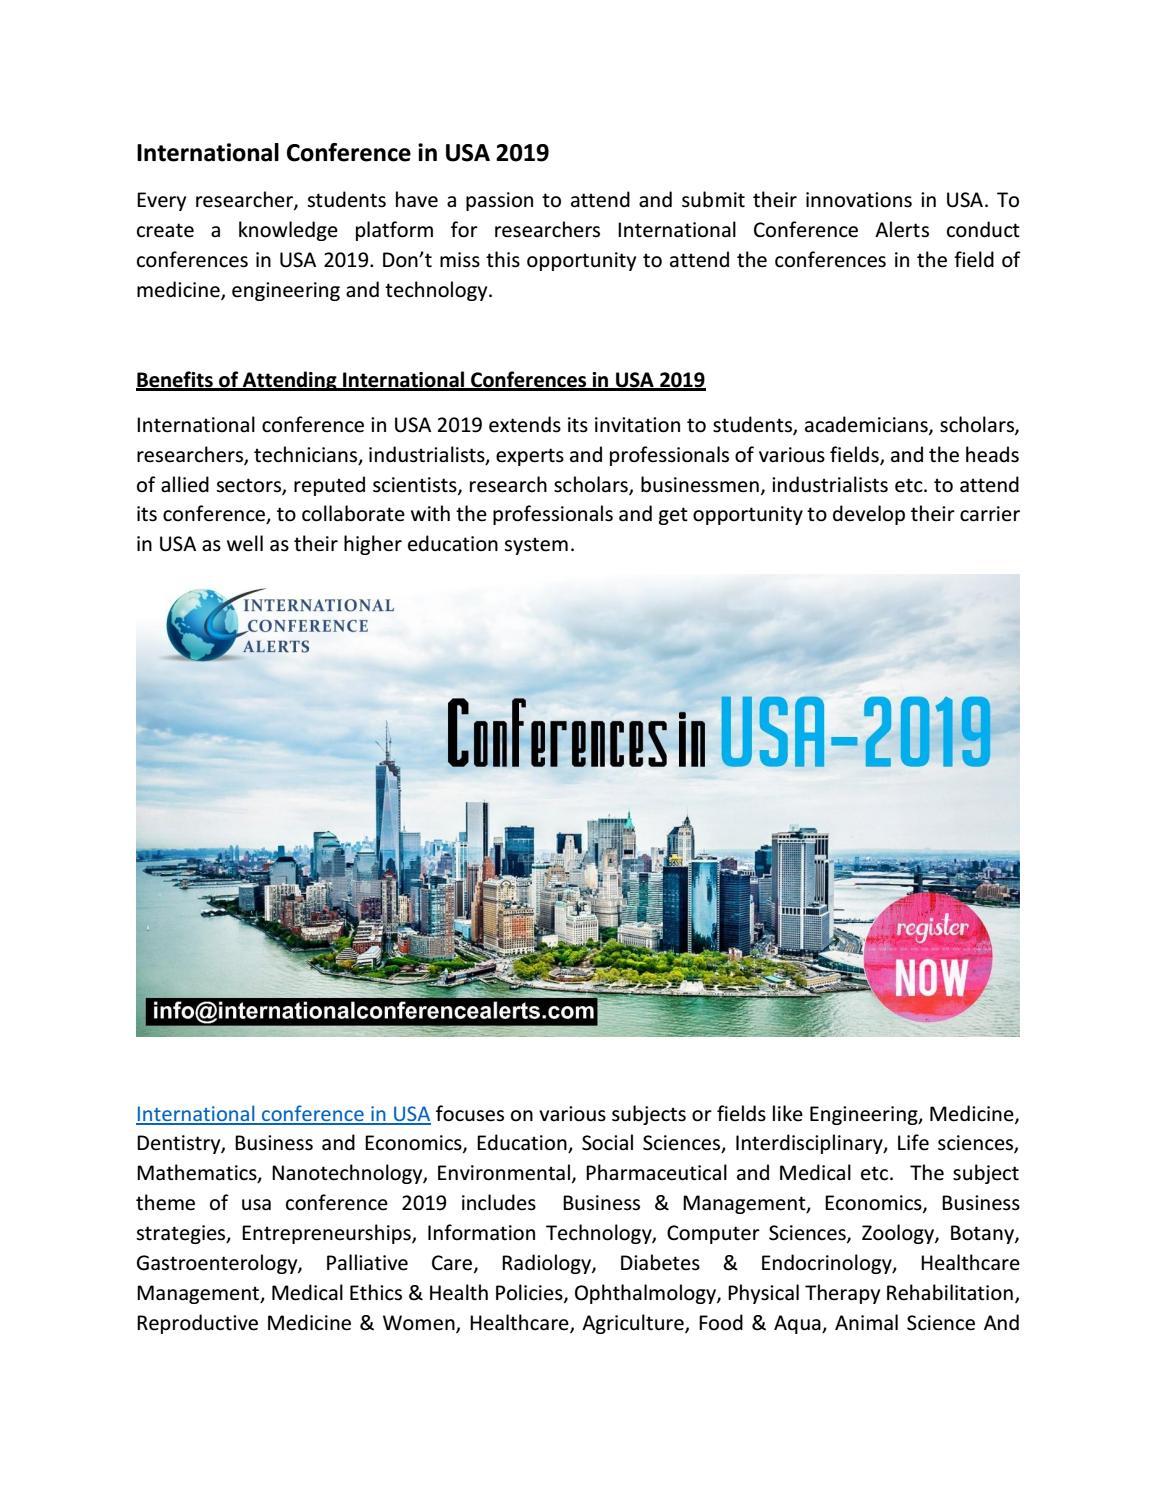 International Conference in USA by Joel Matthew - issuu